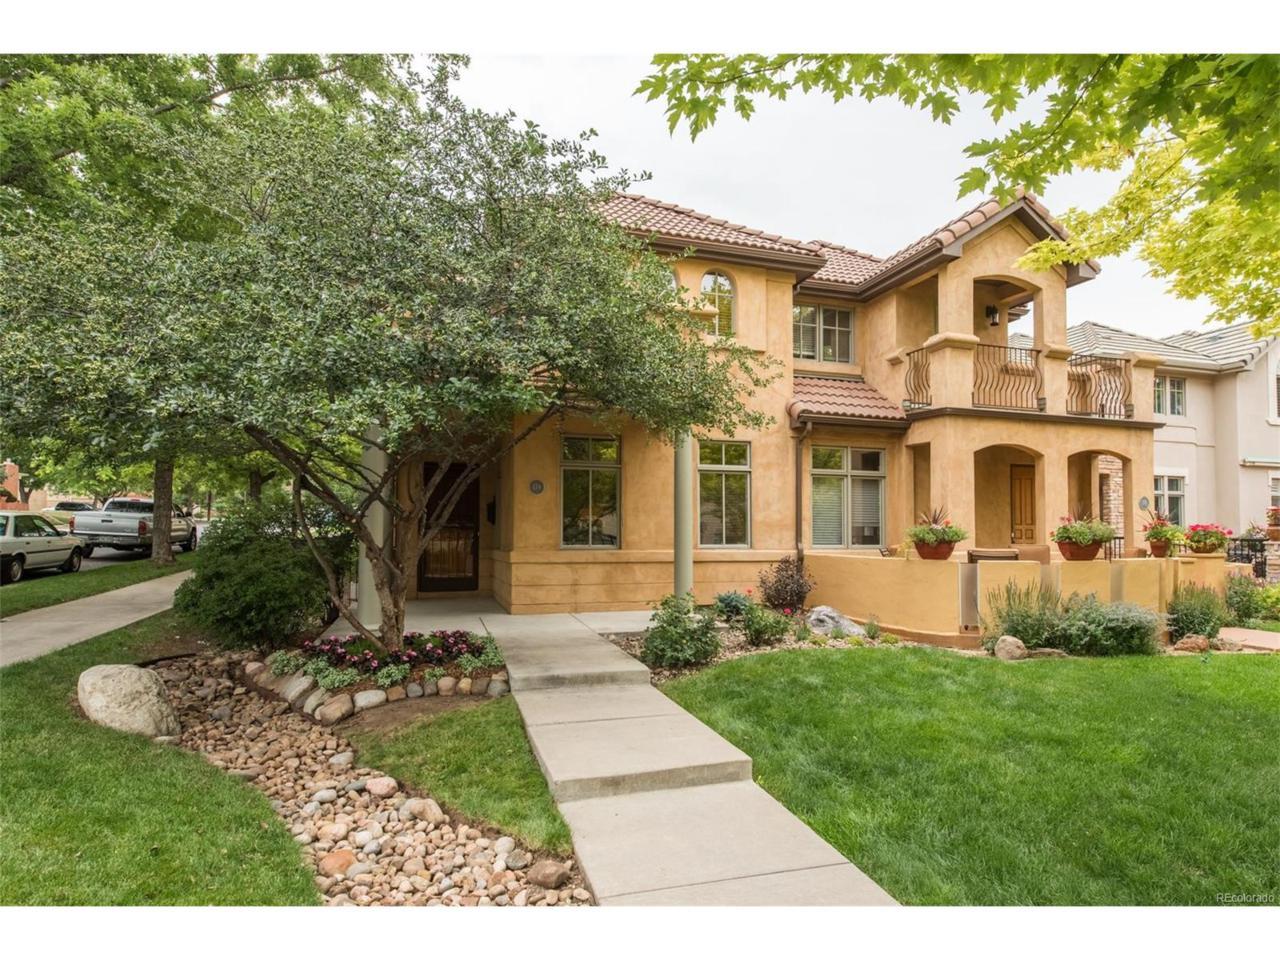 178 Jackson Street, Denver, CO 80206 (MLS #8046937) :: 8z Real Estate